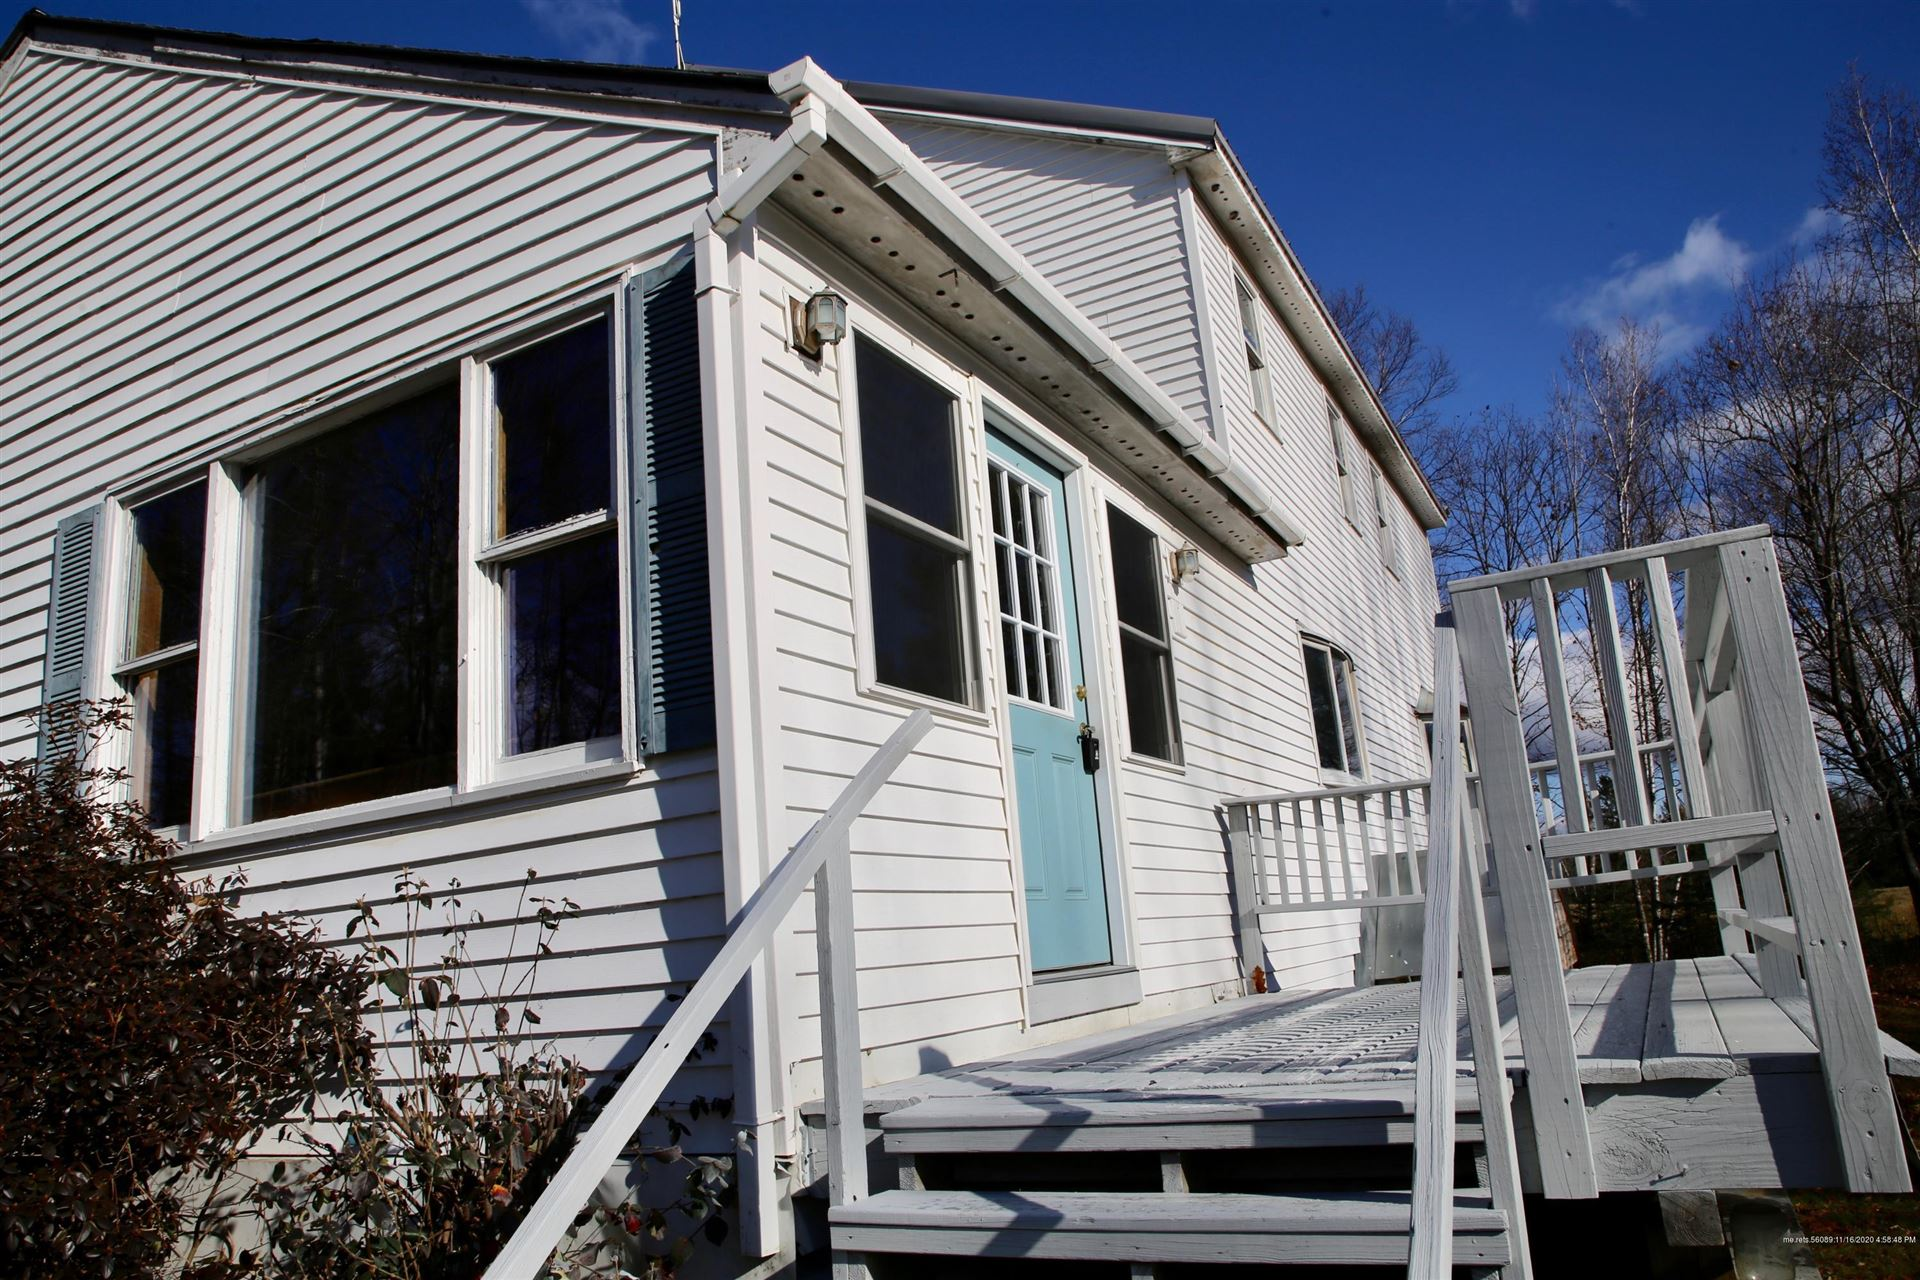 Photo of 1756 Dexter Rd, Dover Foxcroft, ME 04426 (MLS # 1470003)